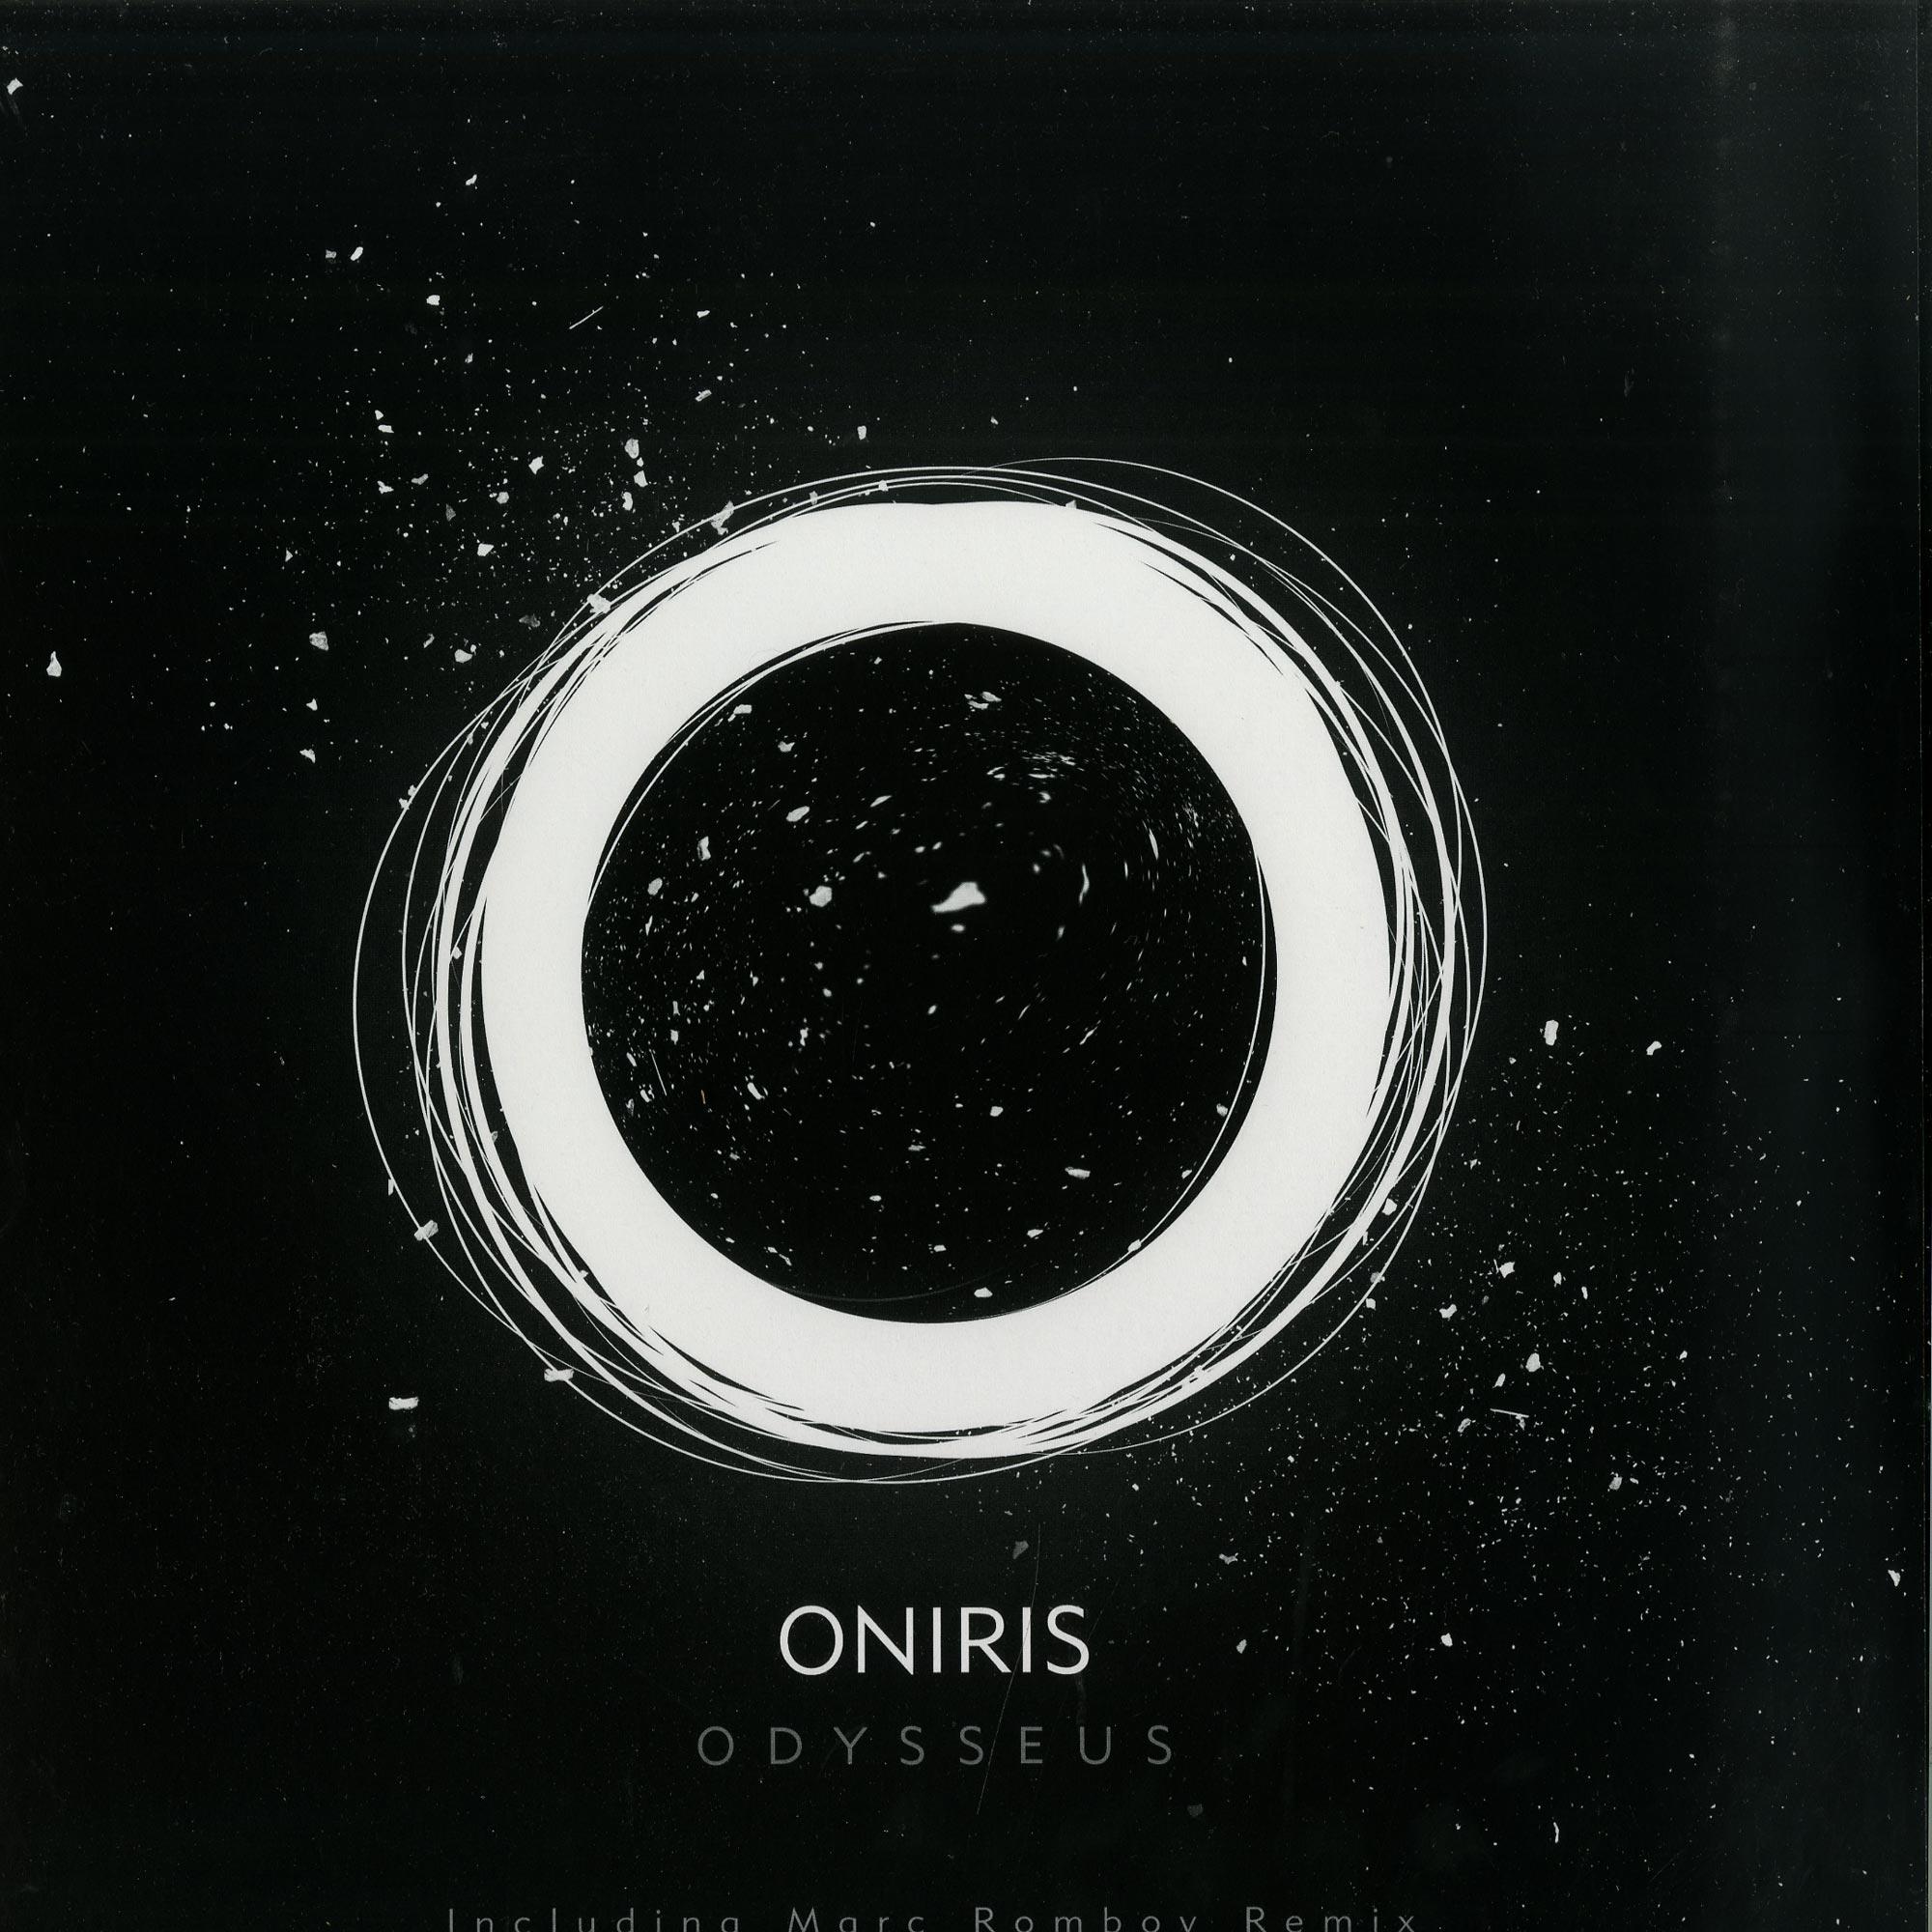 Odysseus - ONIRIS